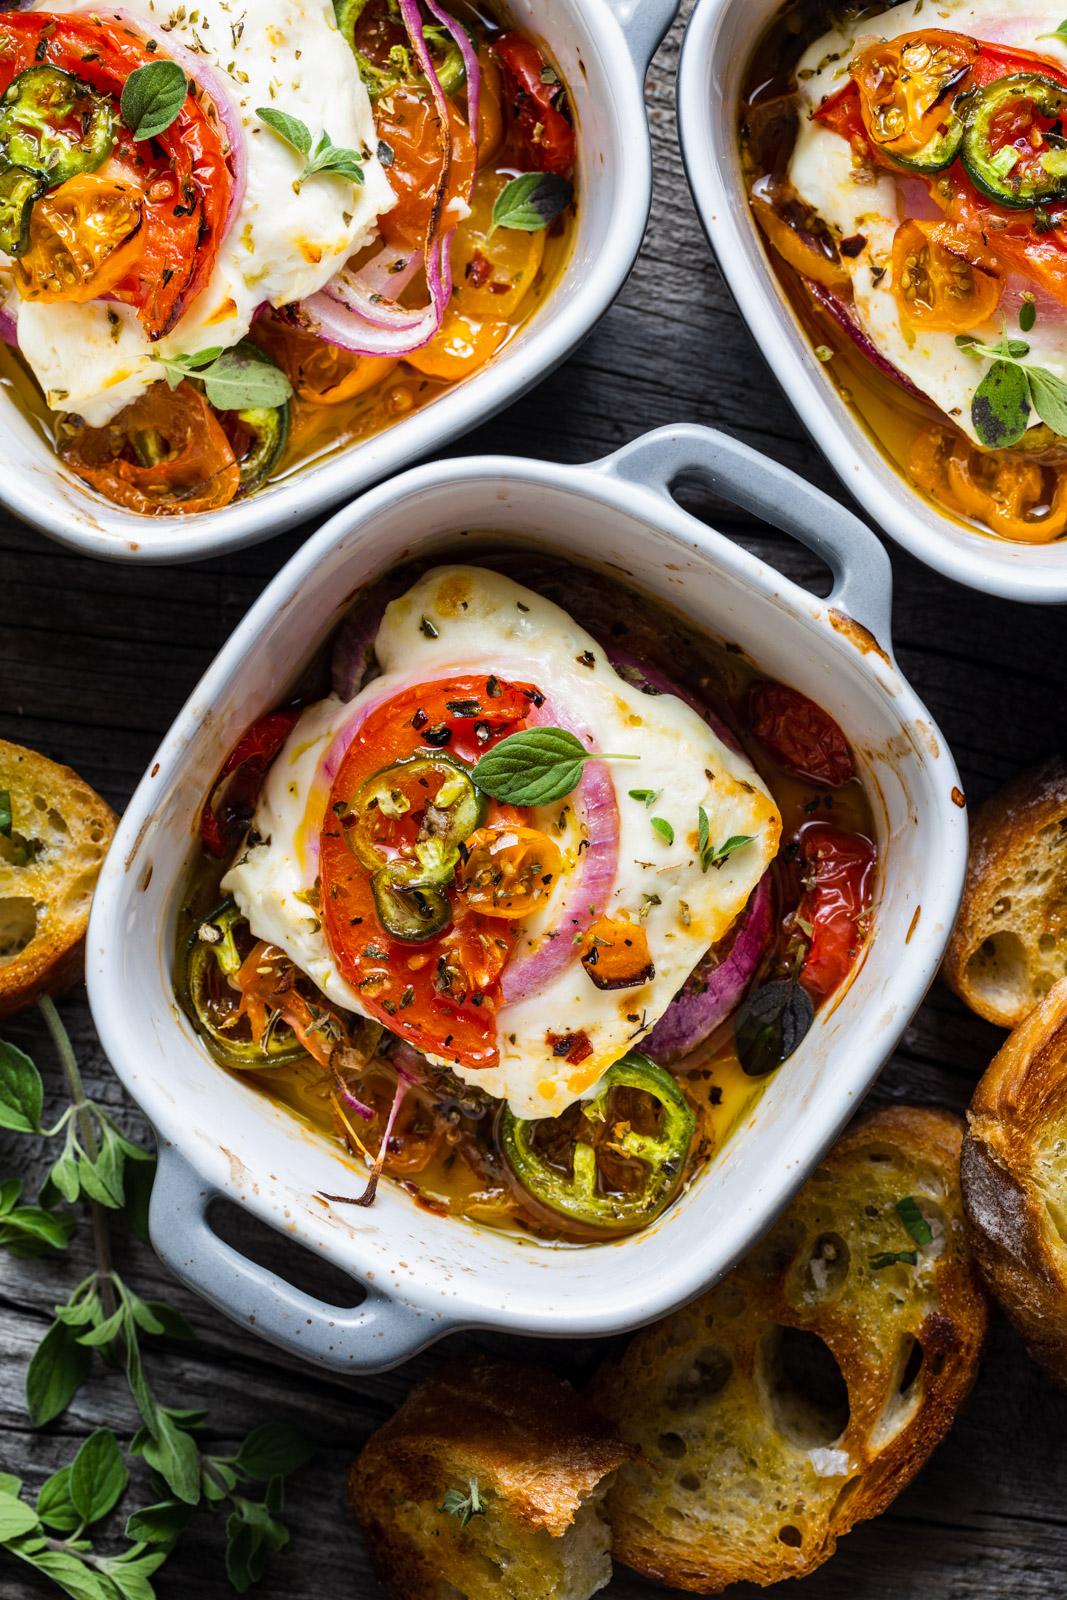 Spicy Baked Feta – Bouyiourdi